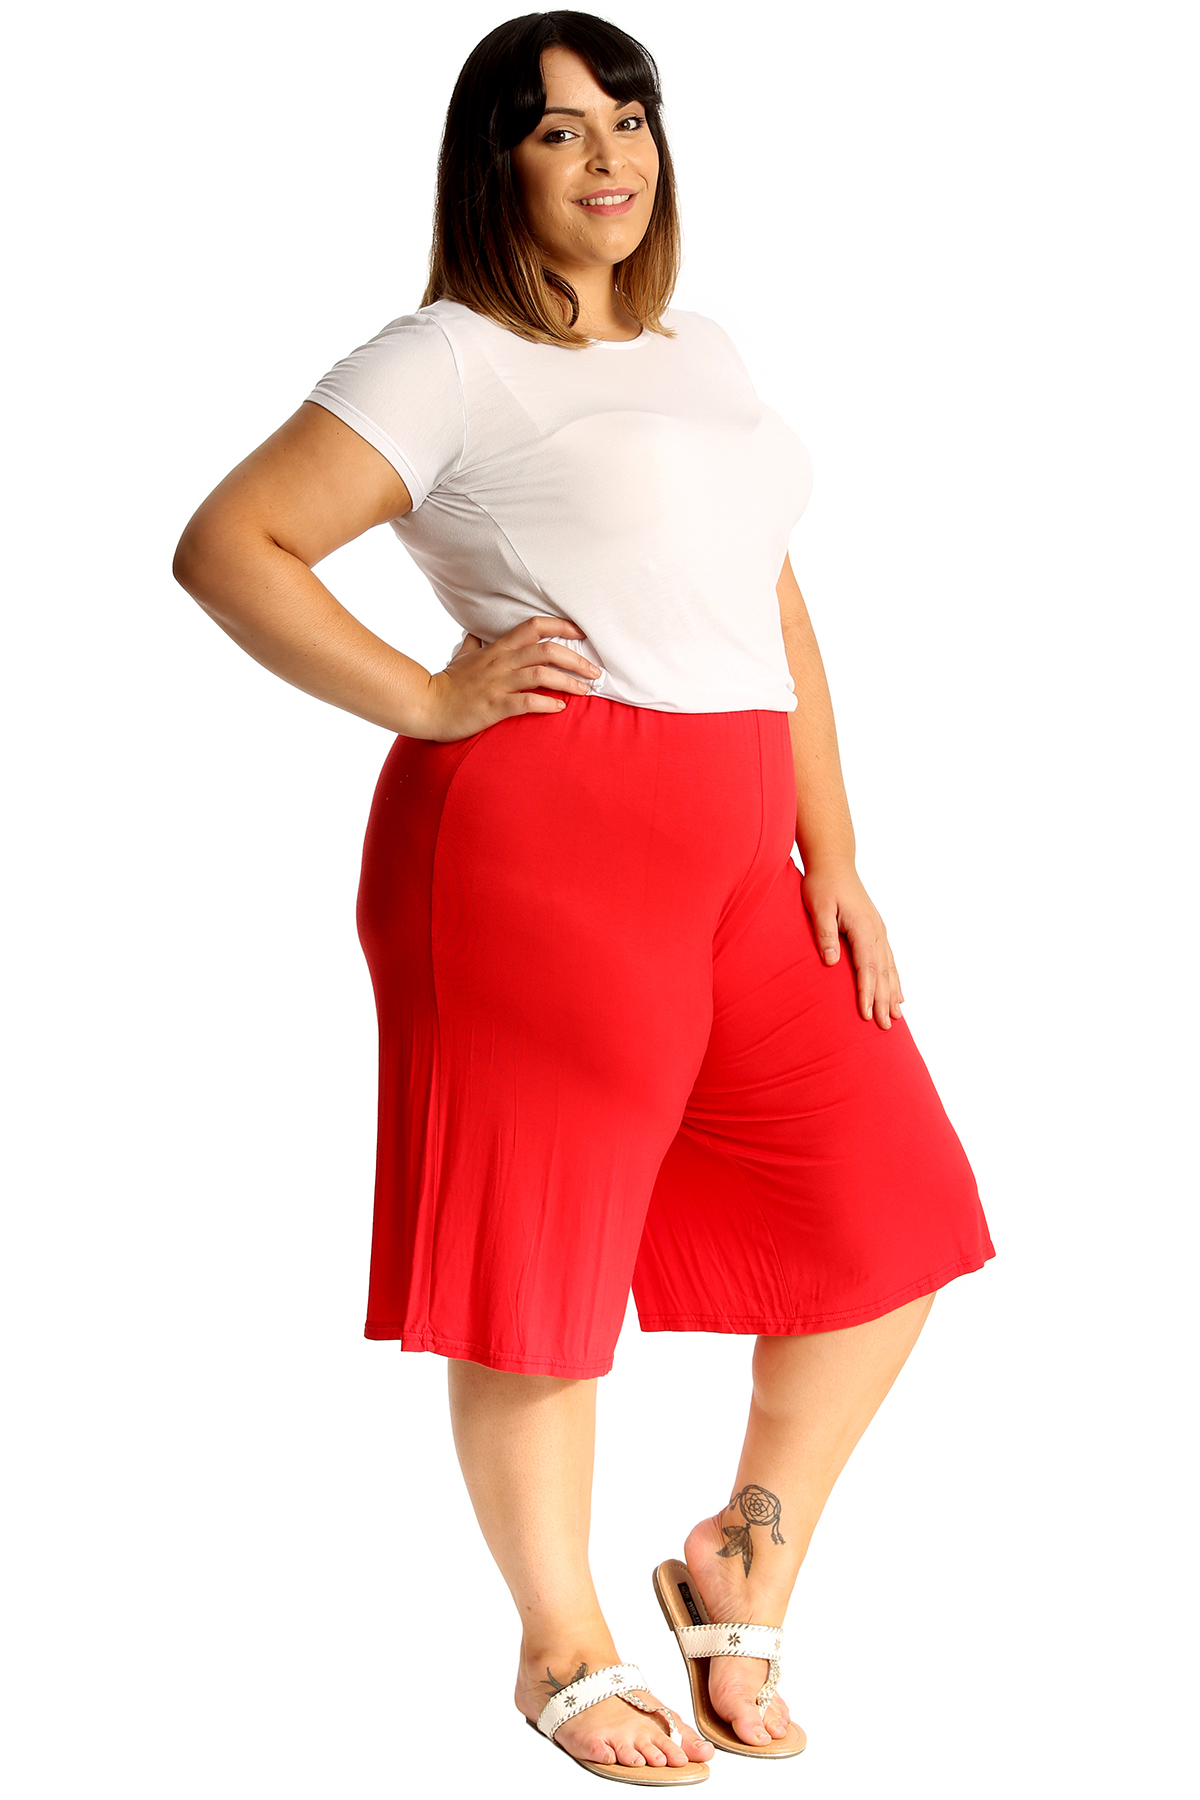 New-Womens-Plus-Size-Culottes-Ladies-Plain-Shorts-Palazzo-Elastic-Pants-Summer thumbnail 35